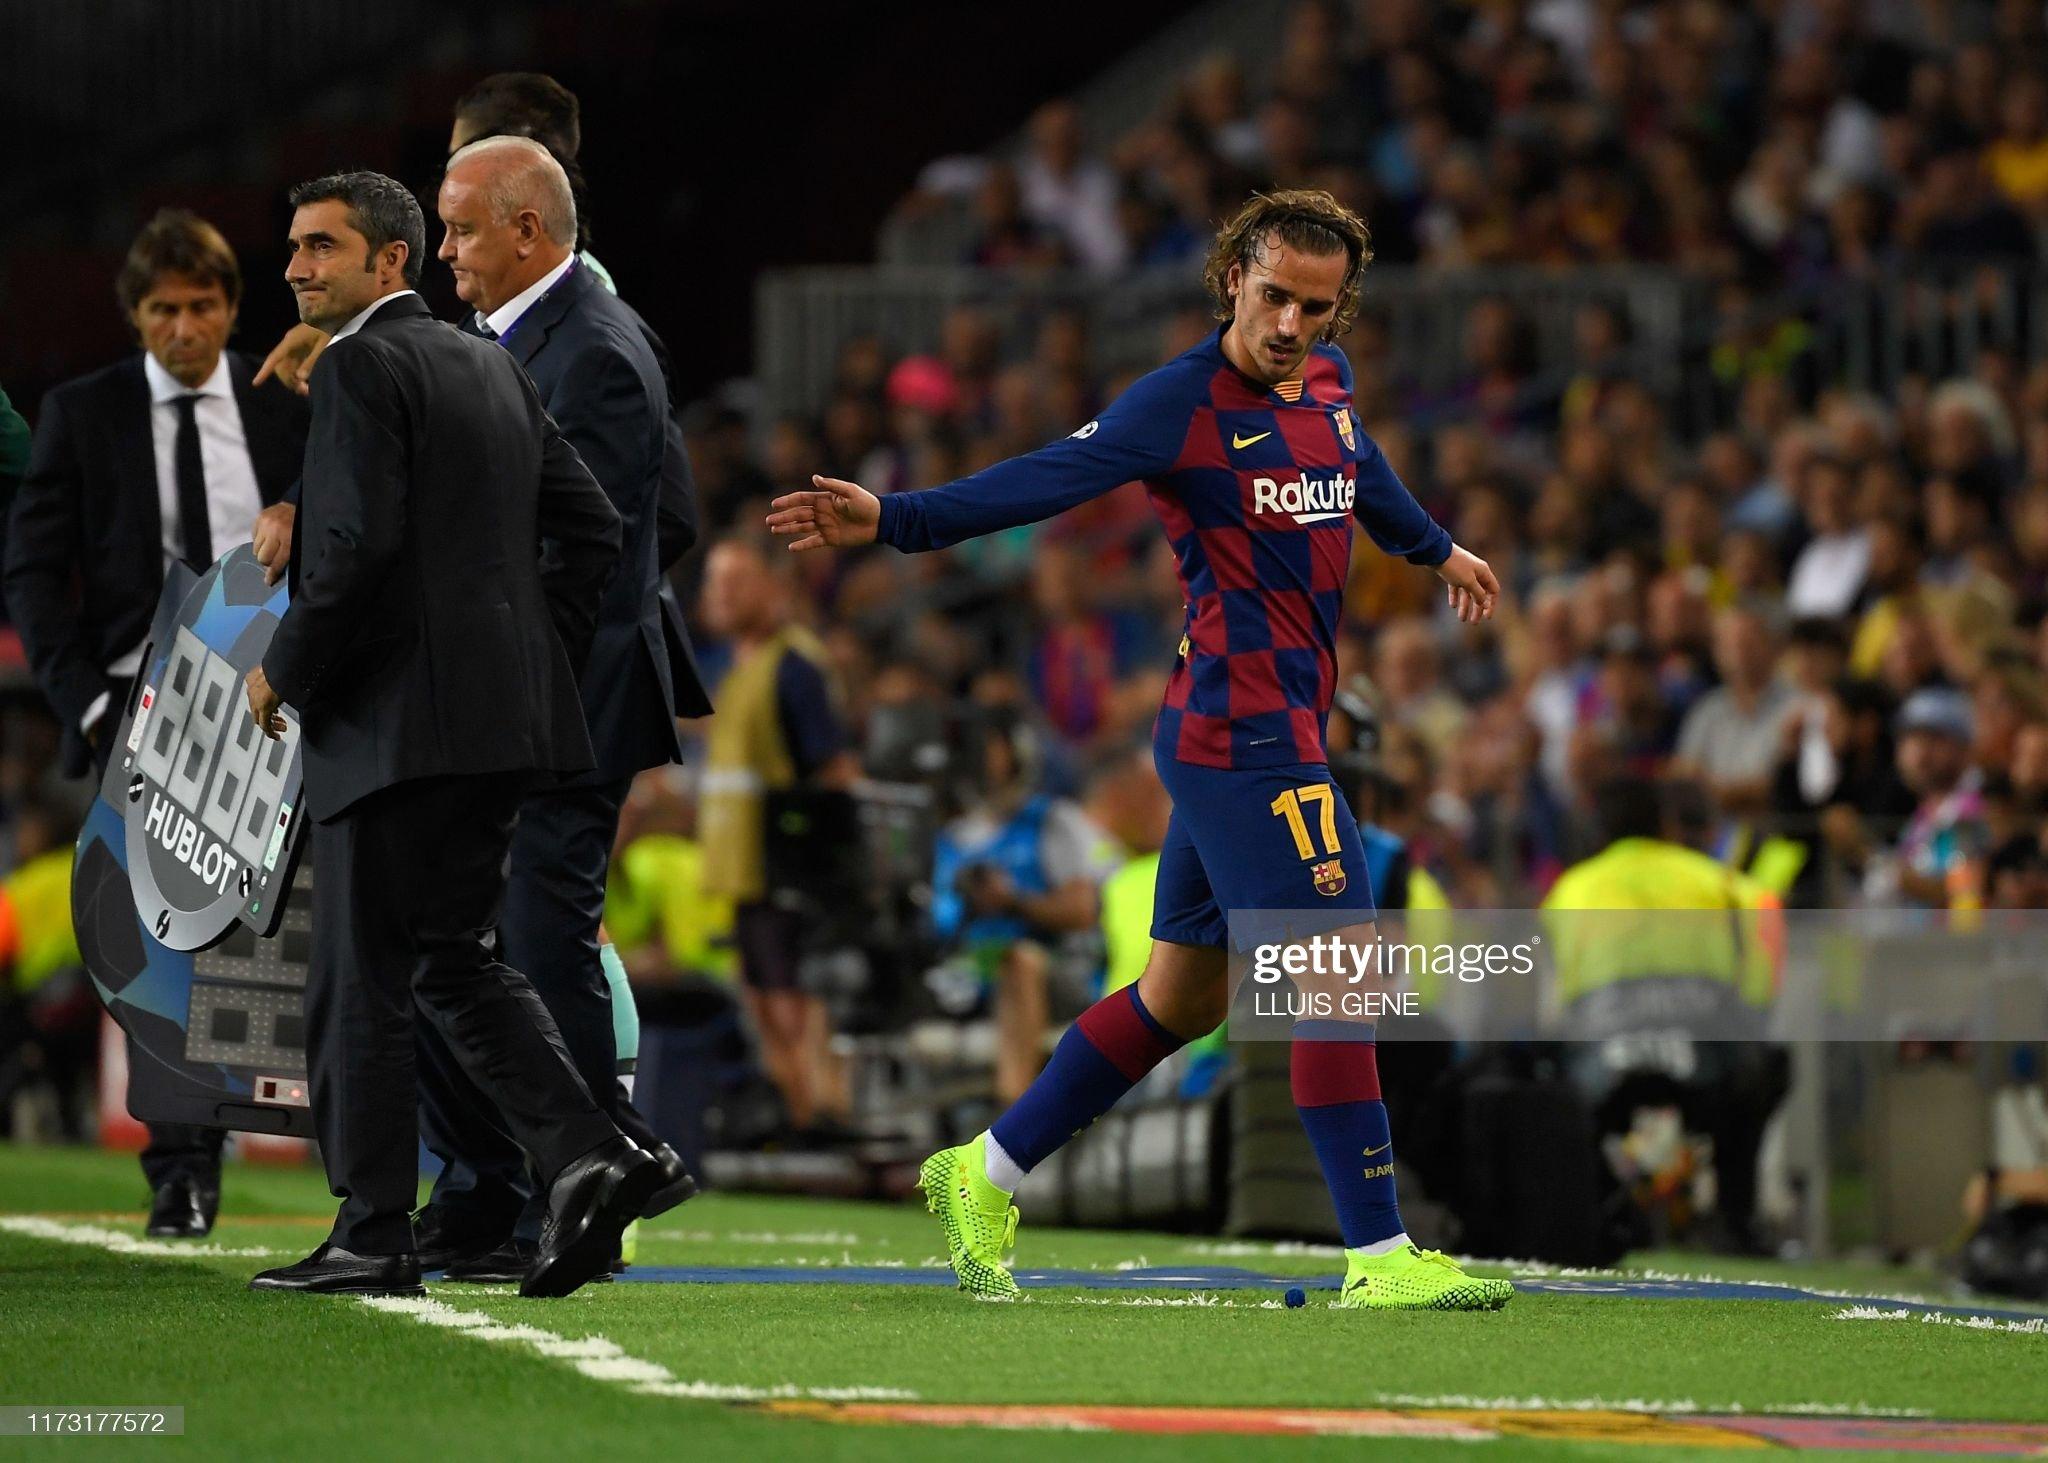 صور مباراة : برشلونة - إنتر 2-1 ( 02-10-2019 )  Barcelonas-french-forward-antoine-griezmann-leaves-the-field-during-picture-id1173177572?s=2048x2048